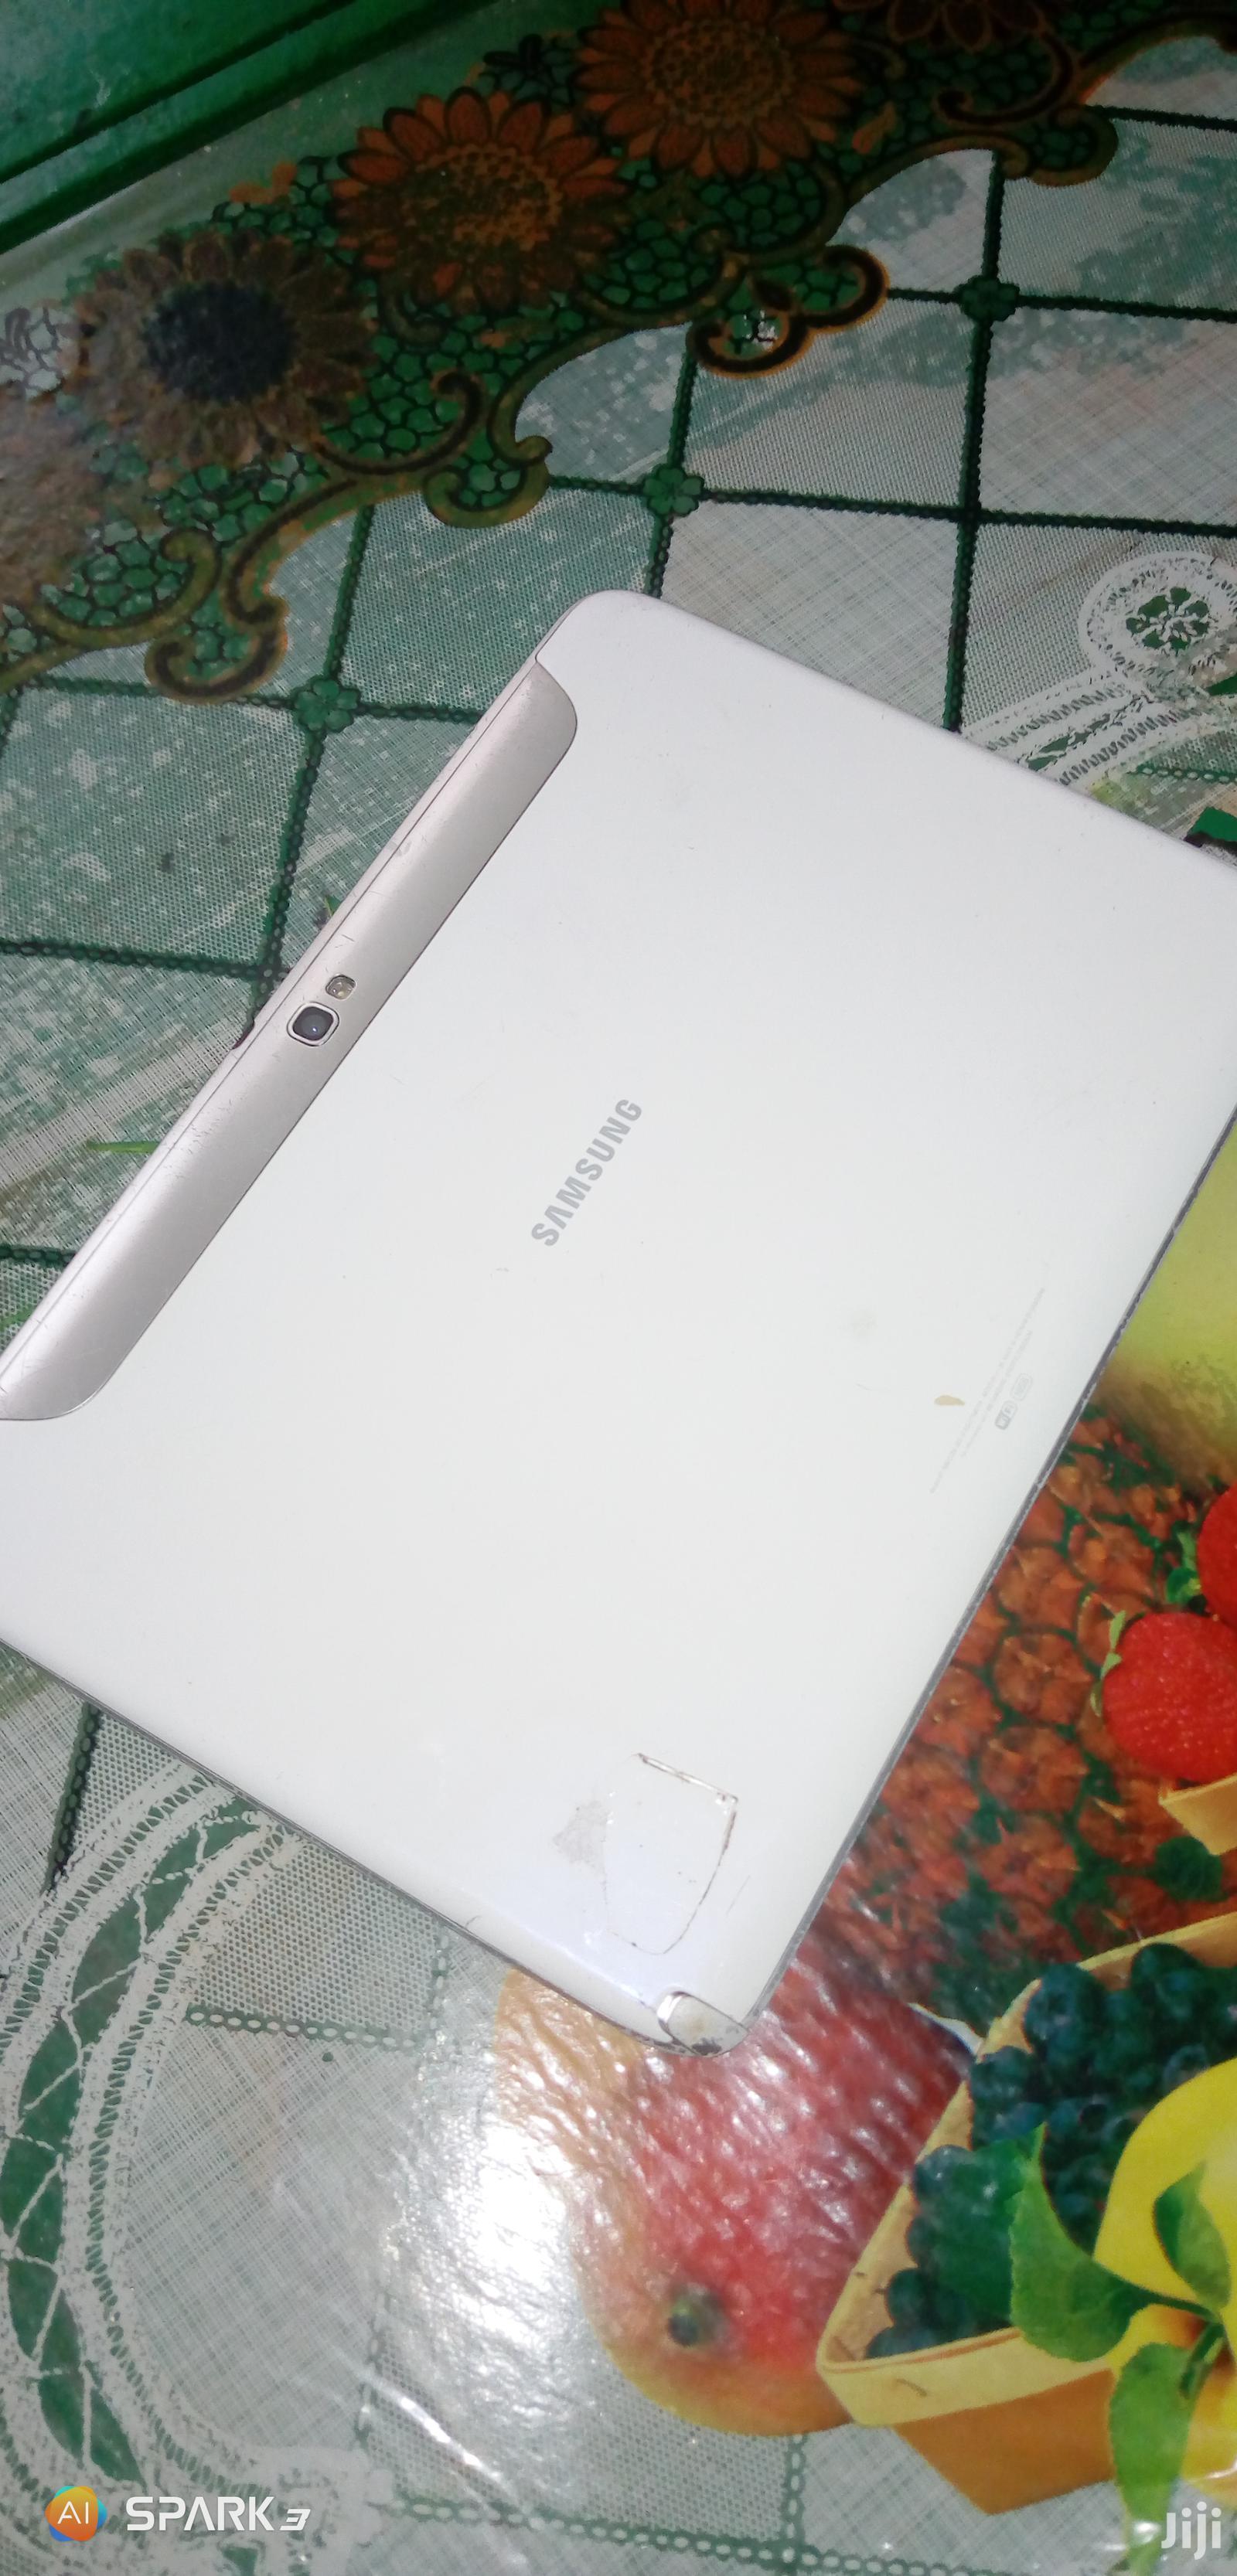 Archive: Samsung Galaxy Note 10.1 N8010 16 GB White